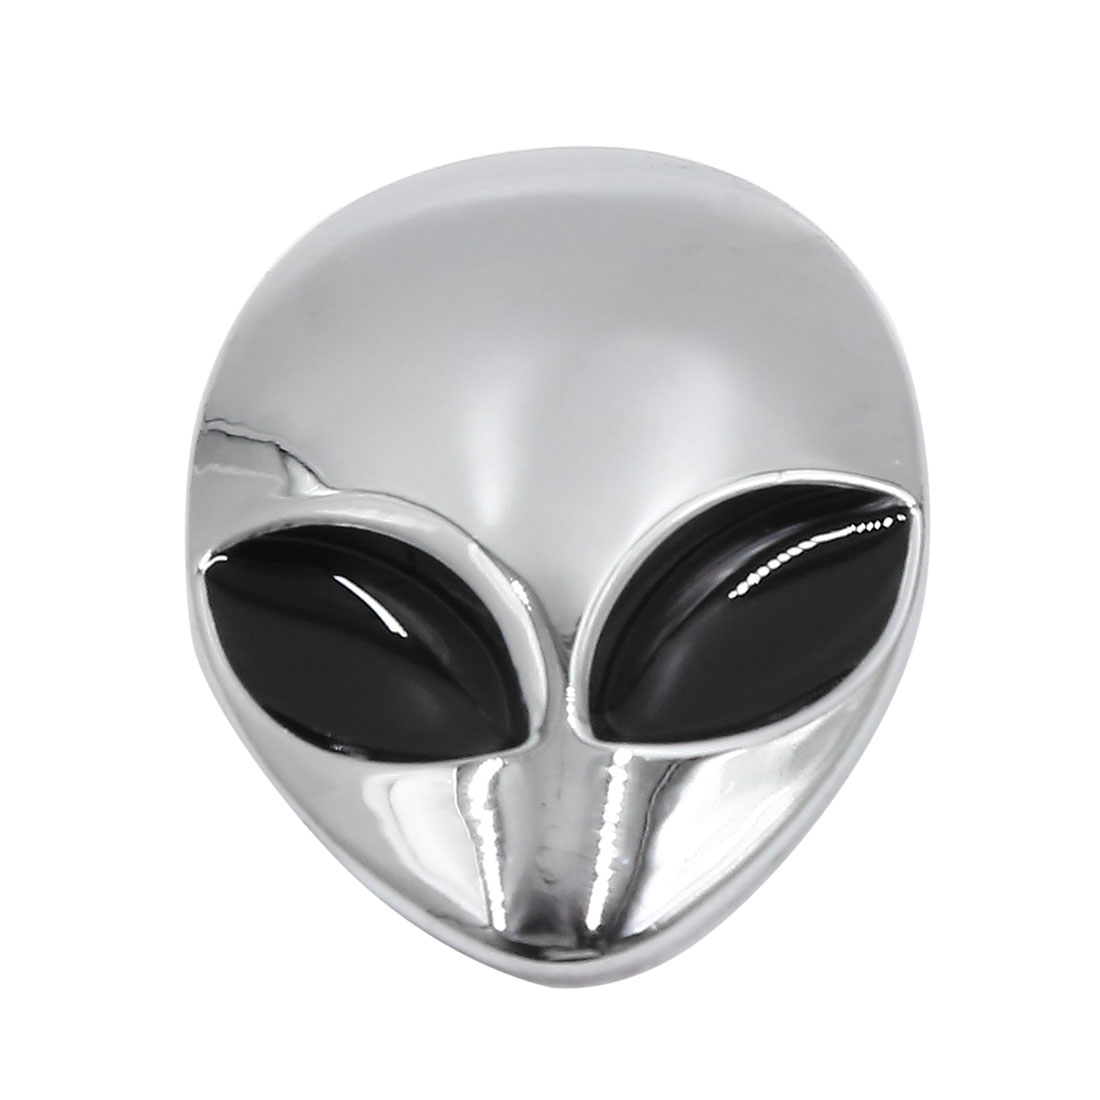 Silver Tone 3D Alien Head Shaped Car Body Decorative Emblem Badge Decal Sticker